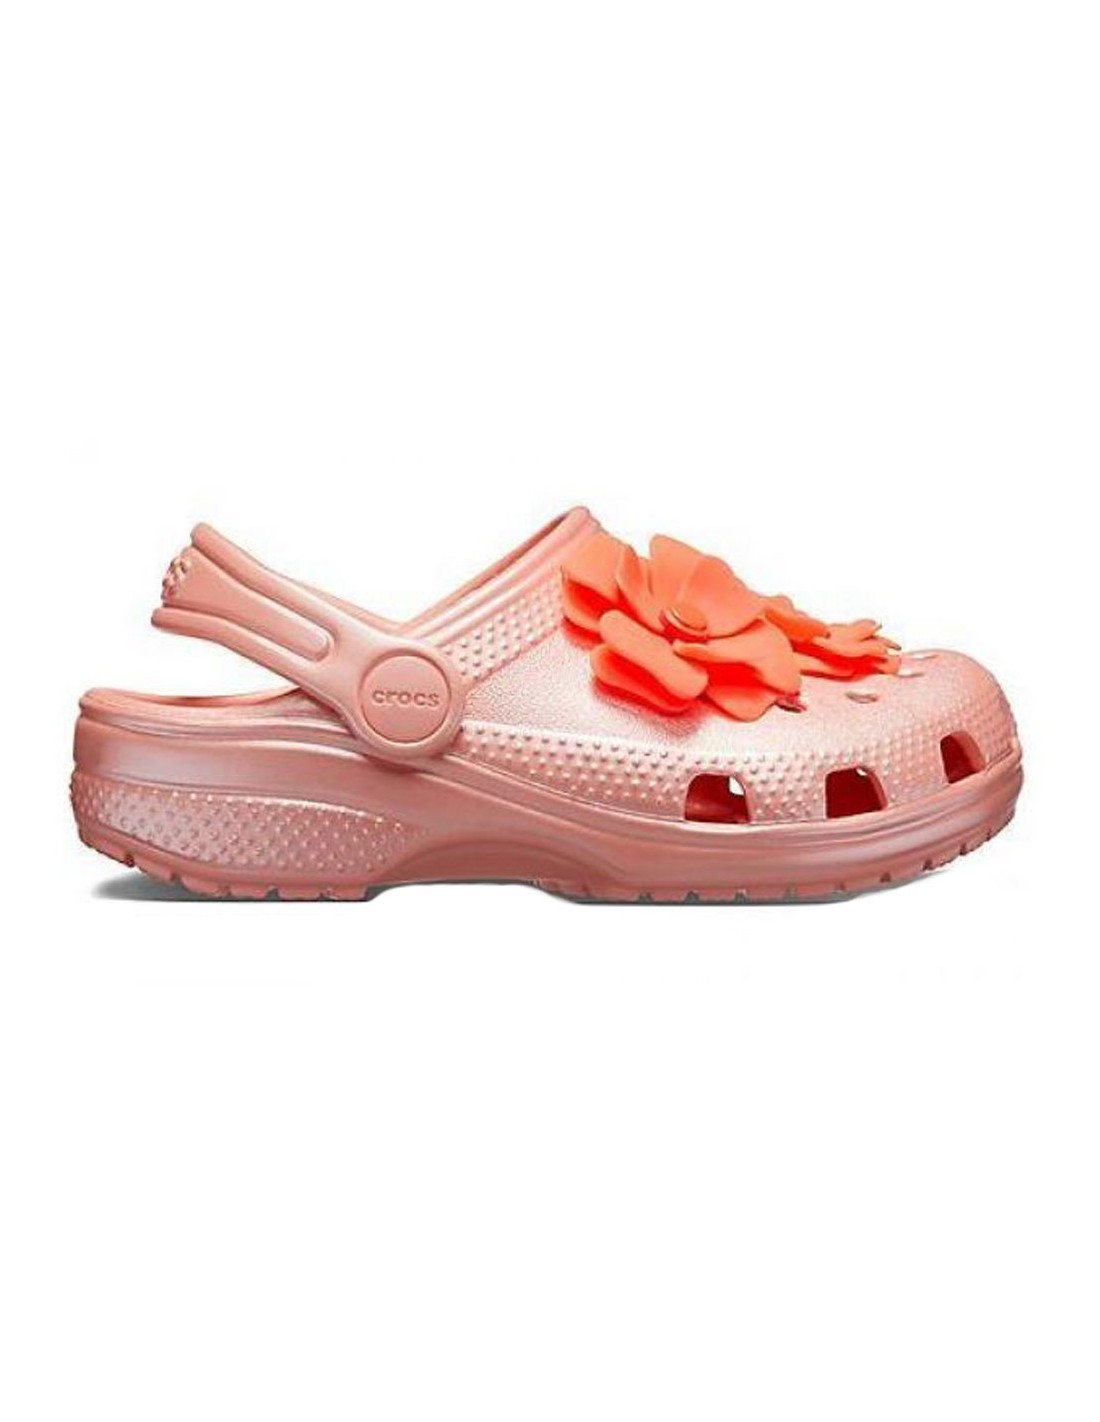 Bambina Sandalo Rosa Blooms Crocs Tjcfk1l Clog vNnwOy80m